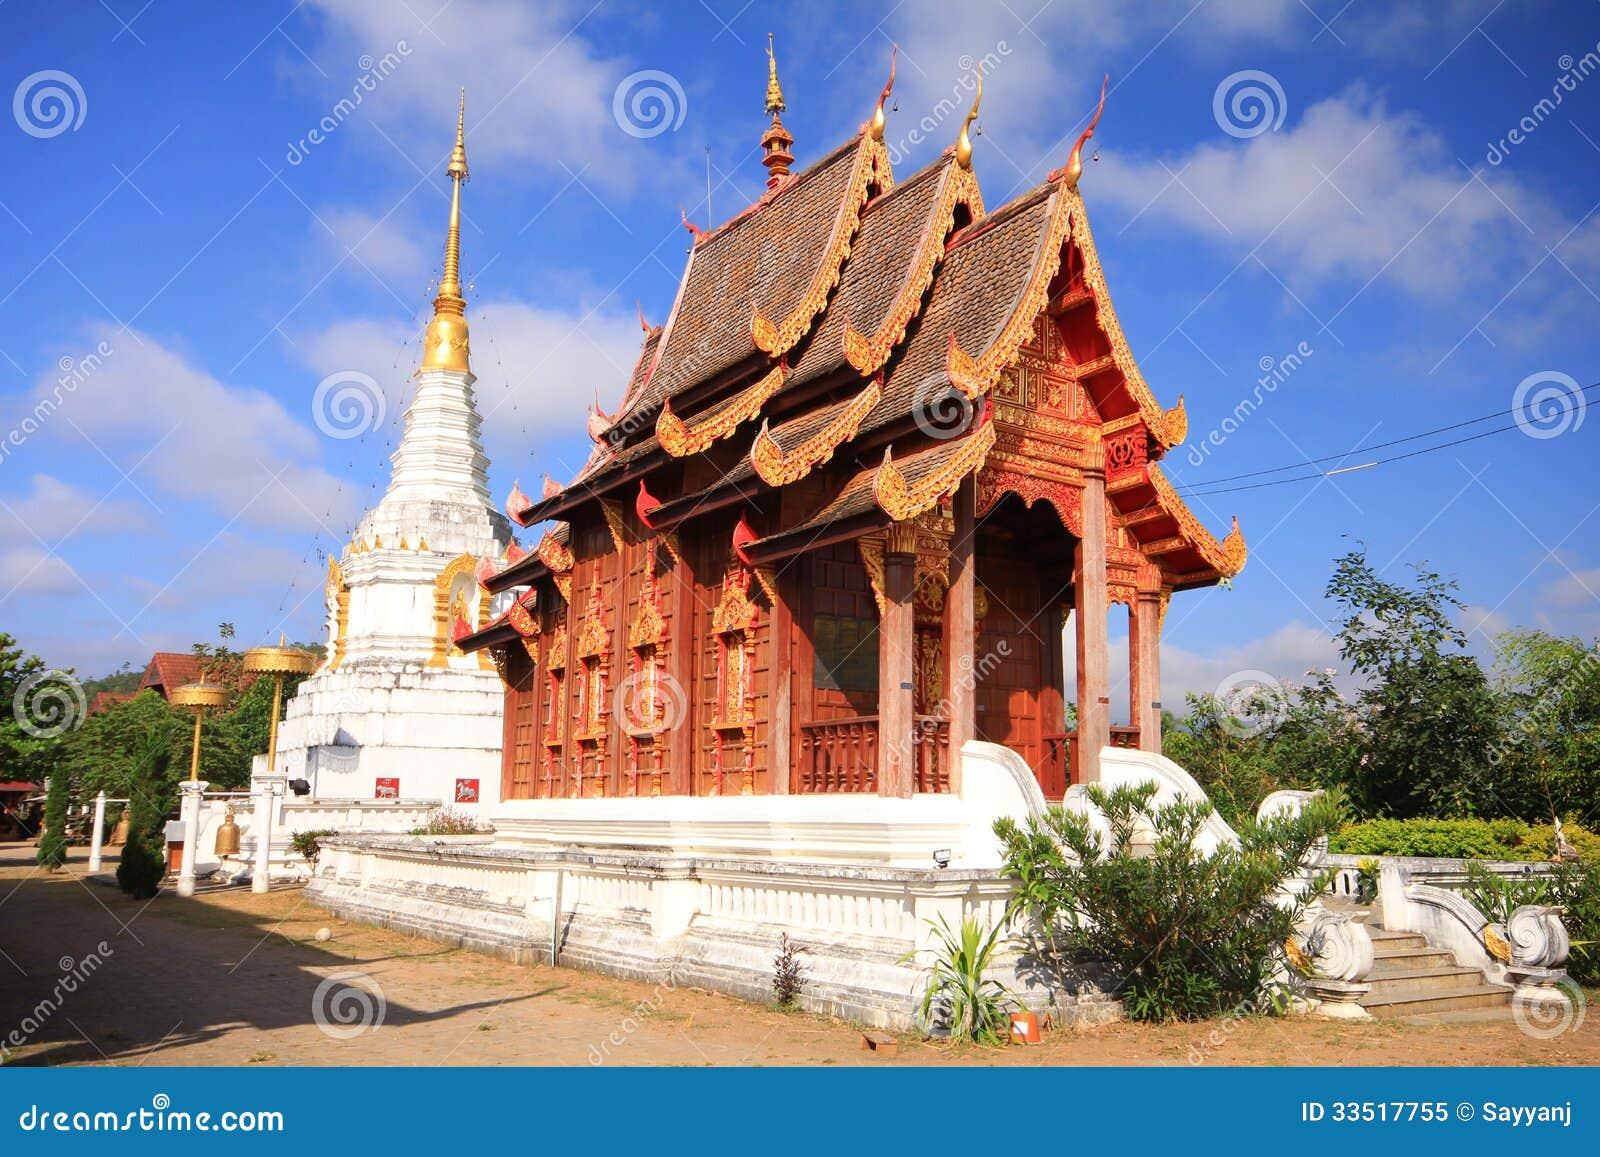 Thailand Temple Thai Buddhism Bangkok Wat Asia Culture Travel Religion Art Architecture Tourism Traditional Buddha